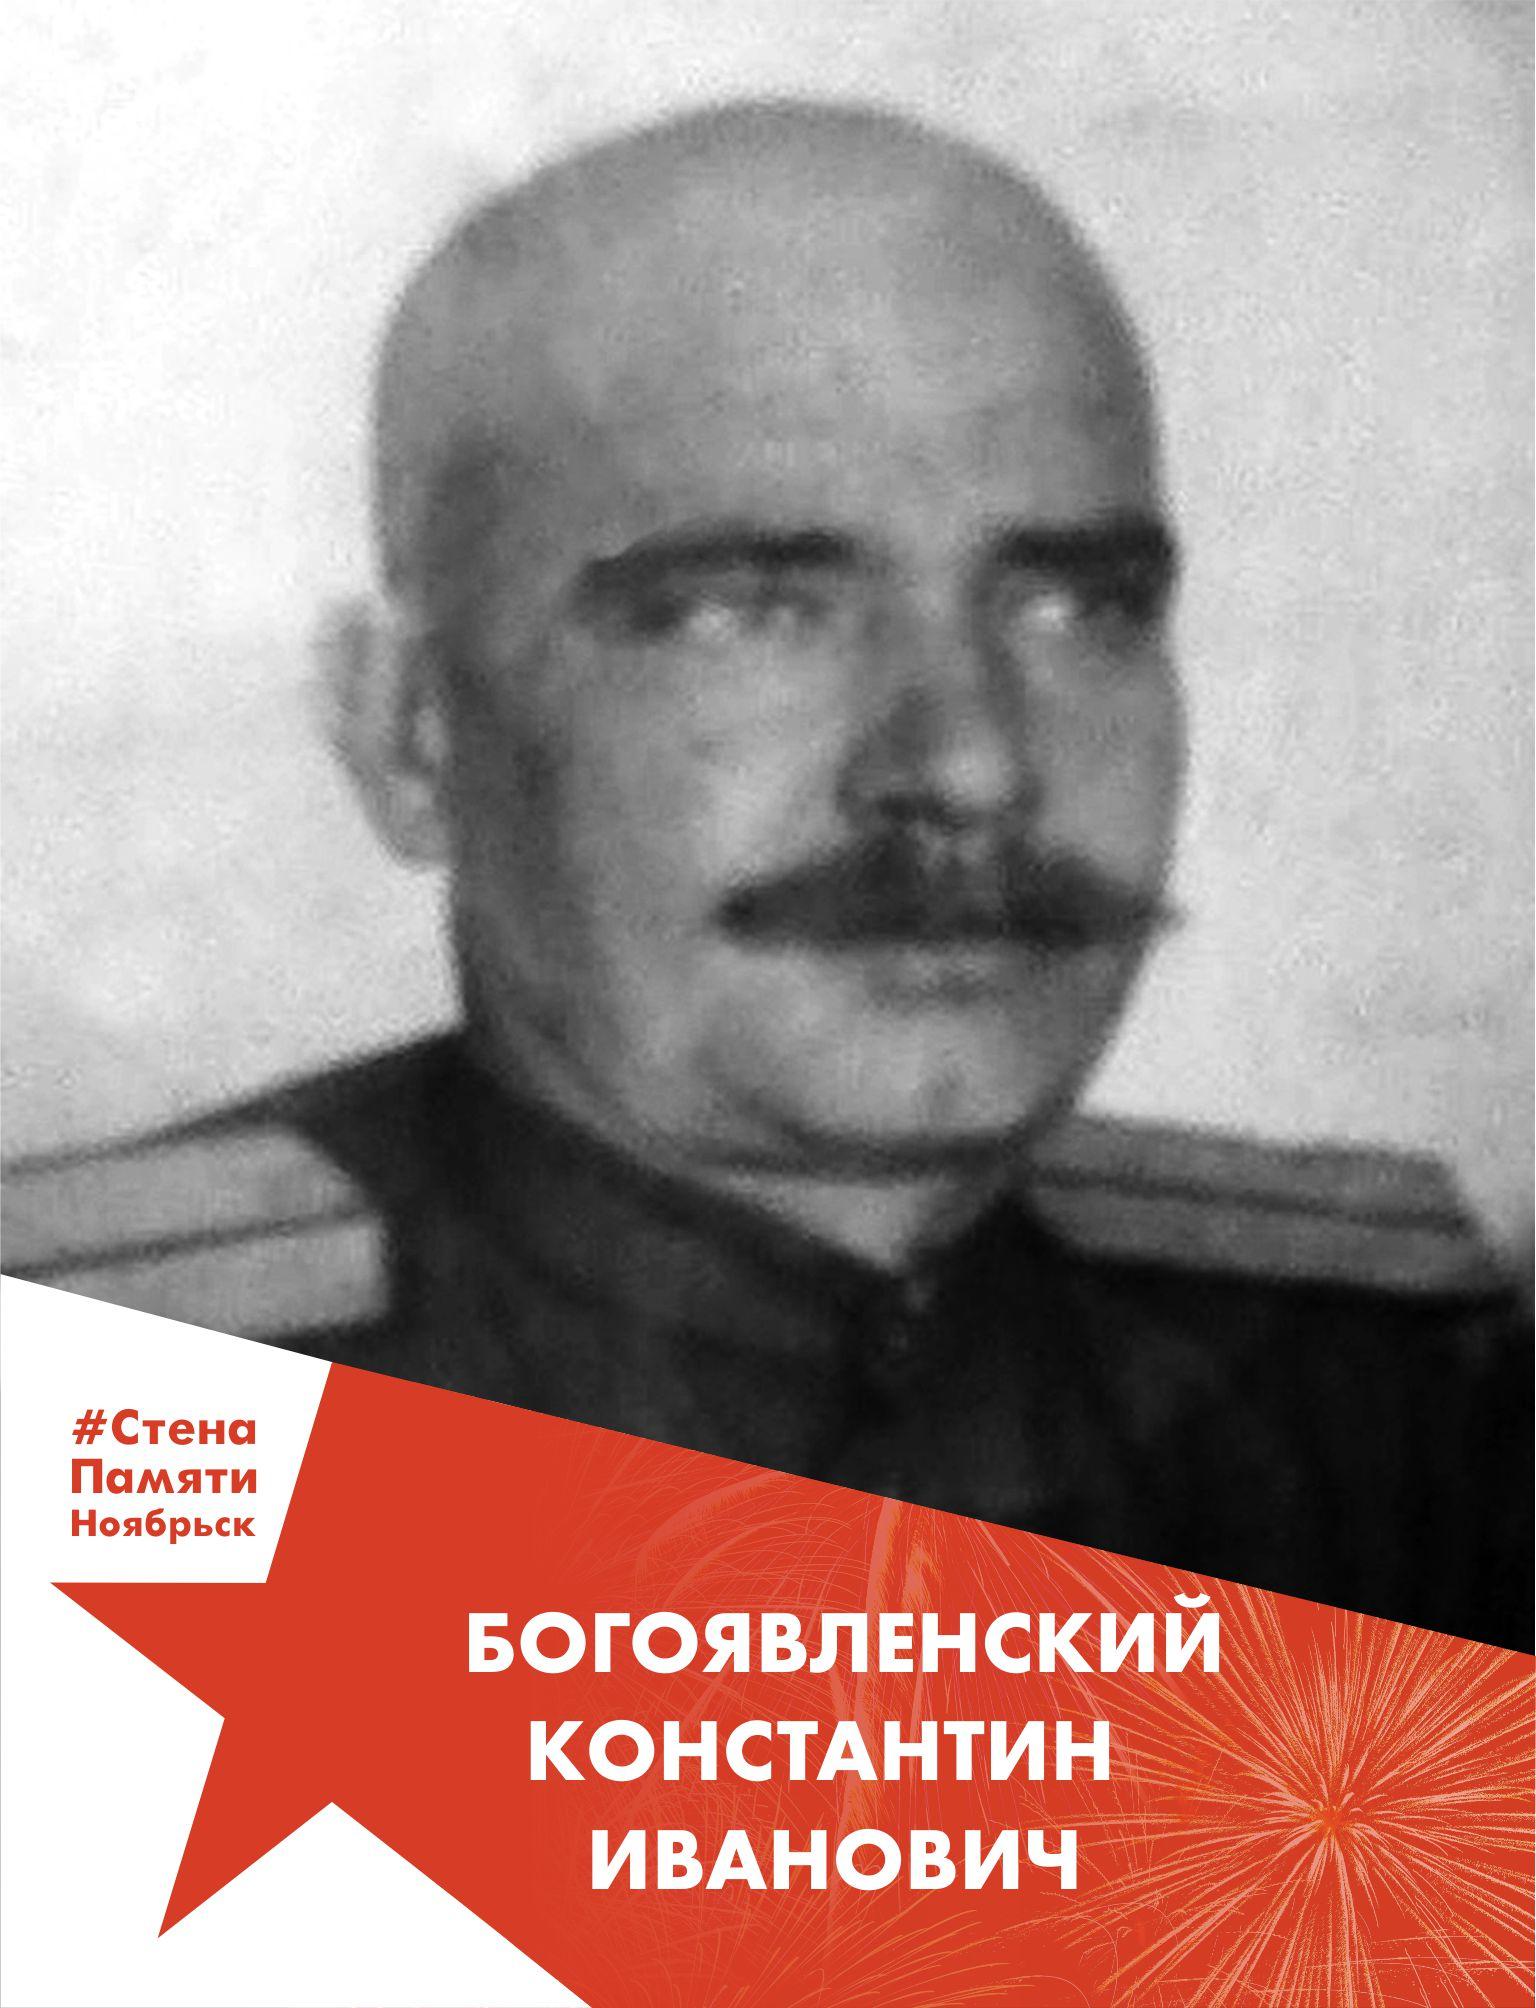 Богоявленский Константин Иванович